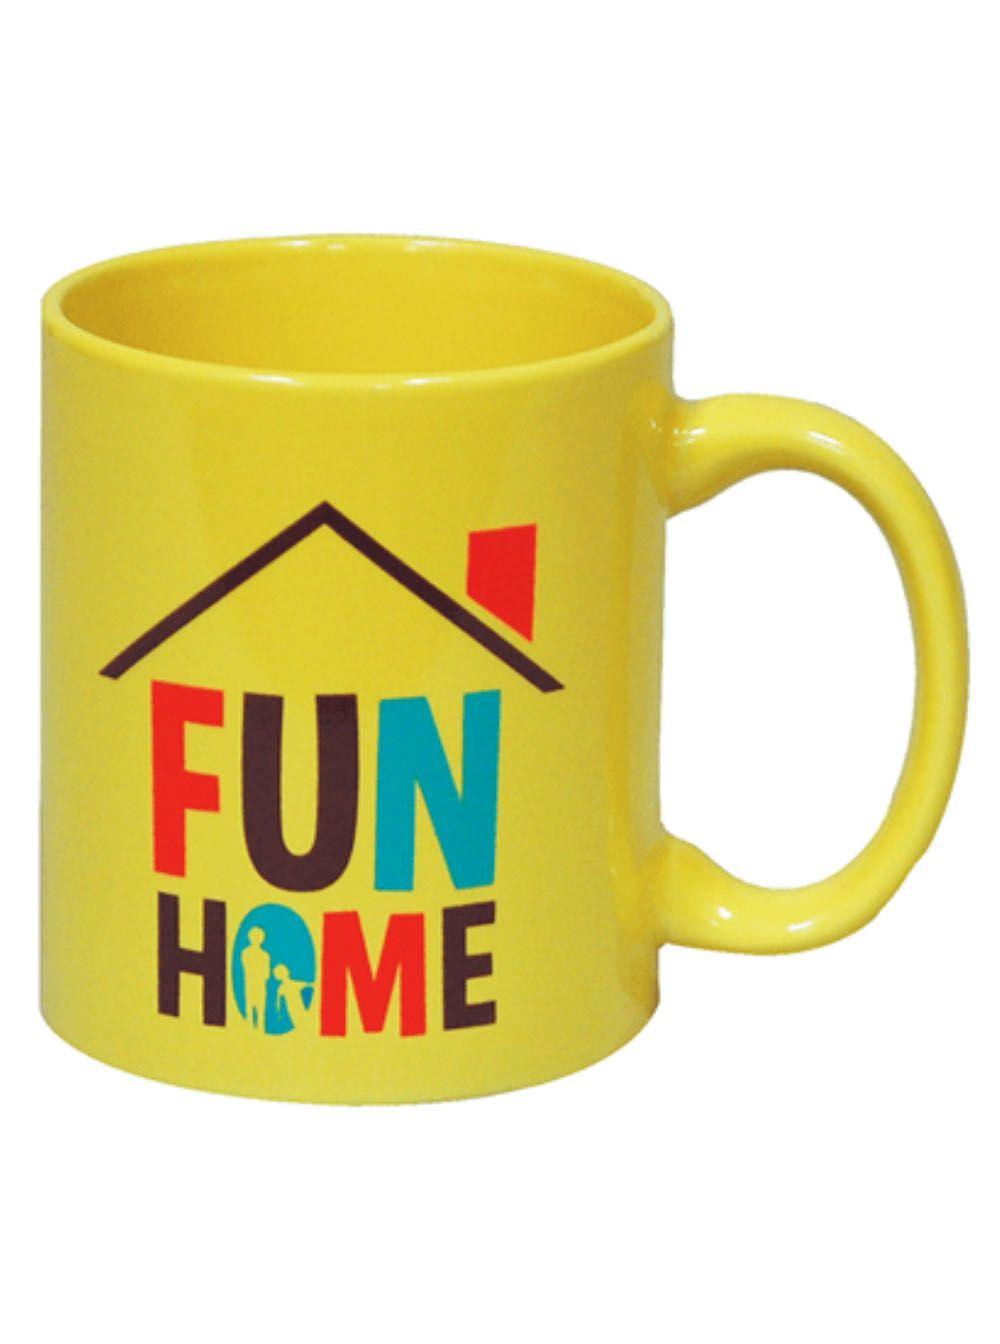 Bright yellow 11oz ceramic coffee mug with the full color Fun Home logo. Dishwasher safe.